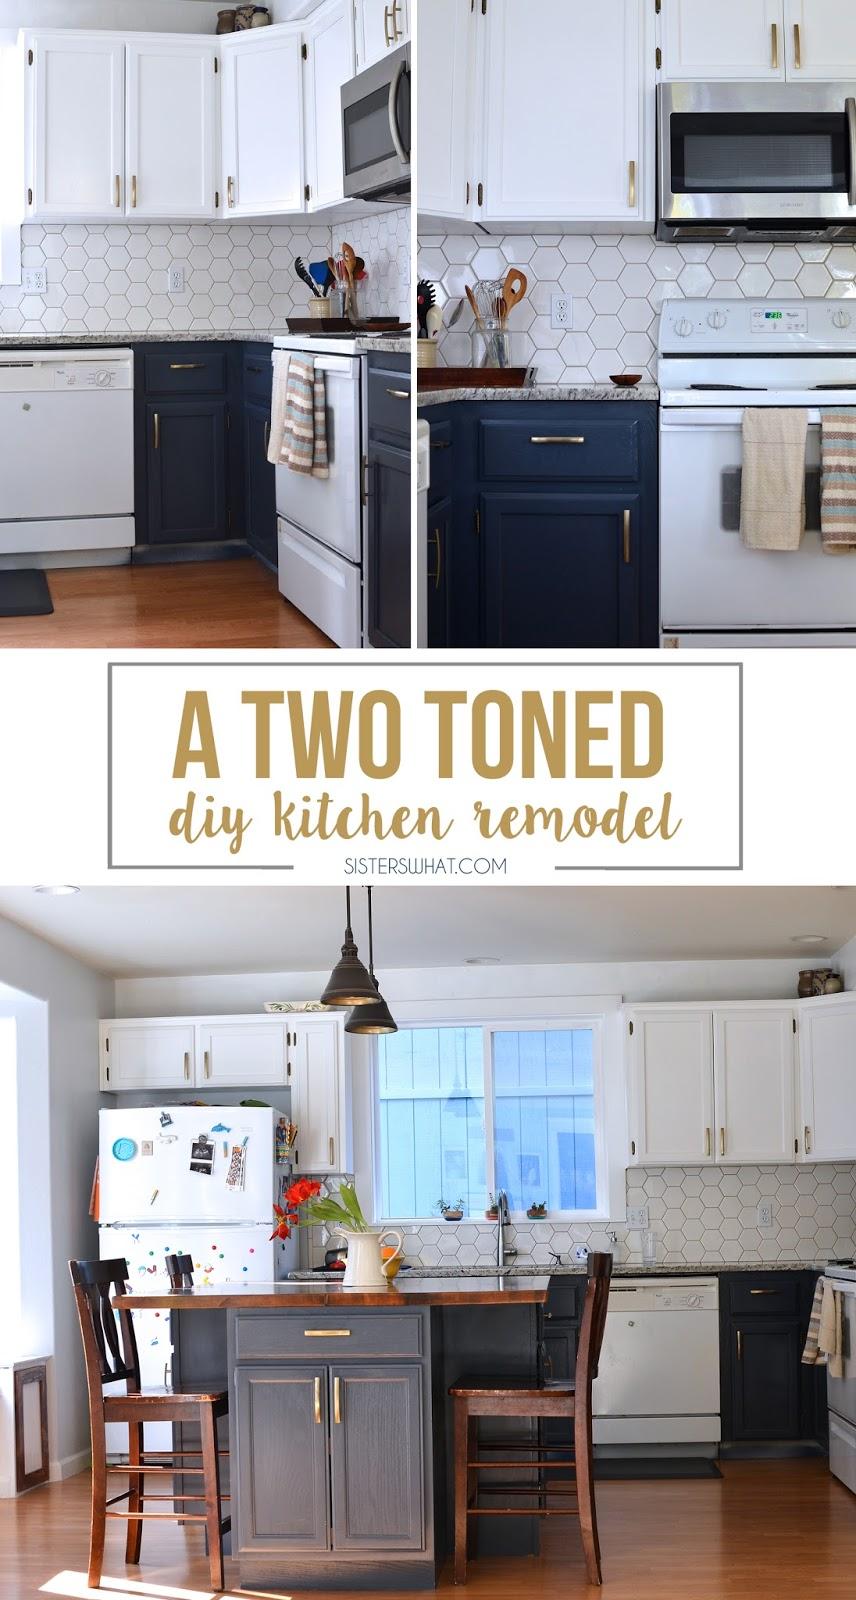 a two toned diy kitchen remodel diy kitchen remodel a two toned diy kitchen remodel